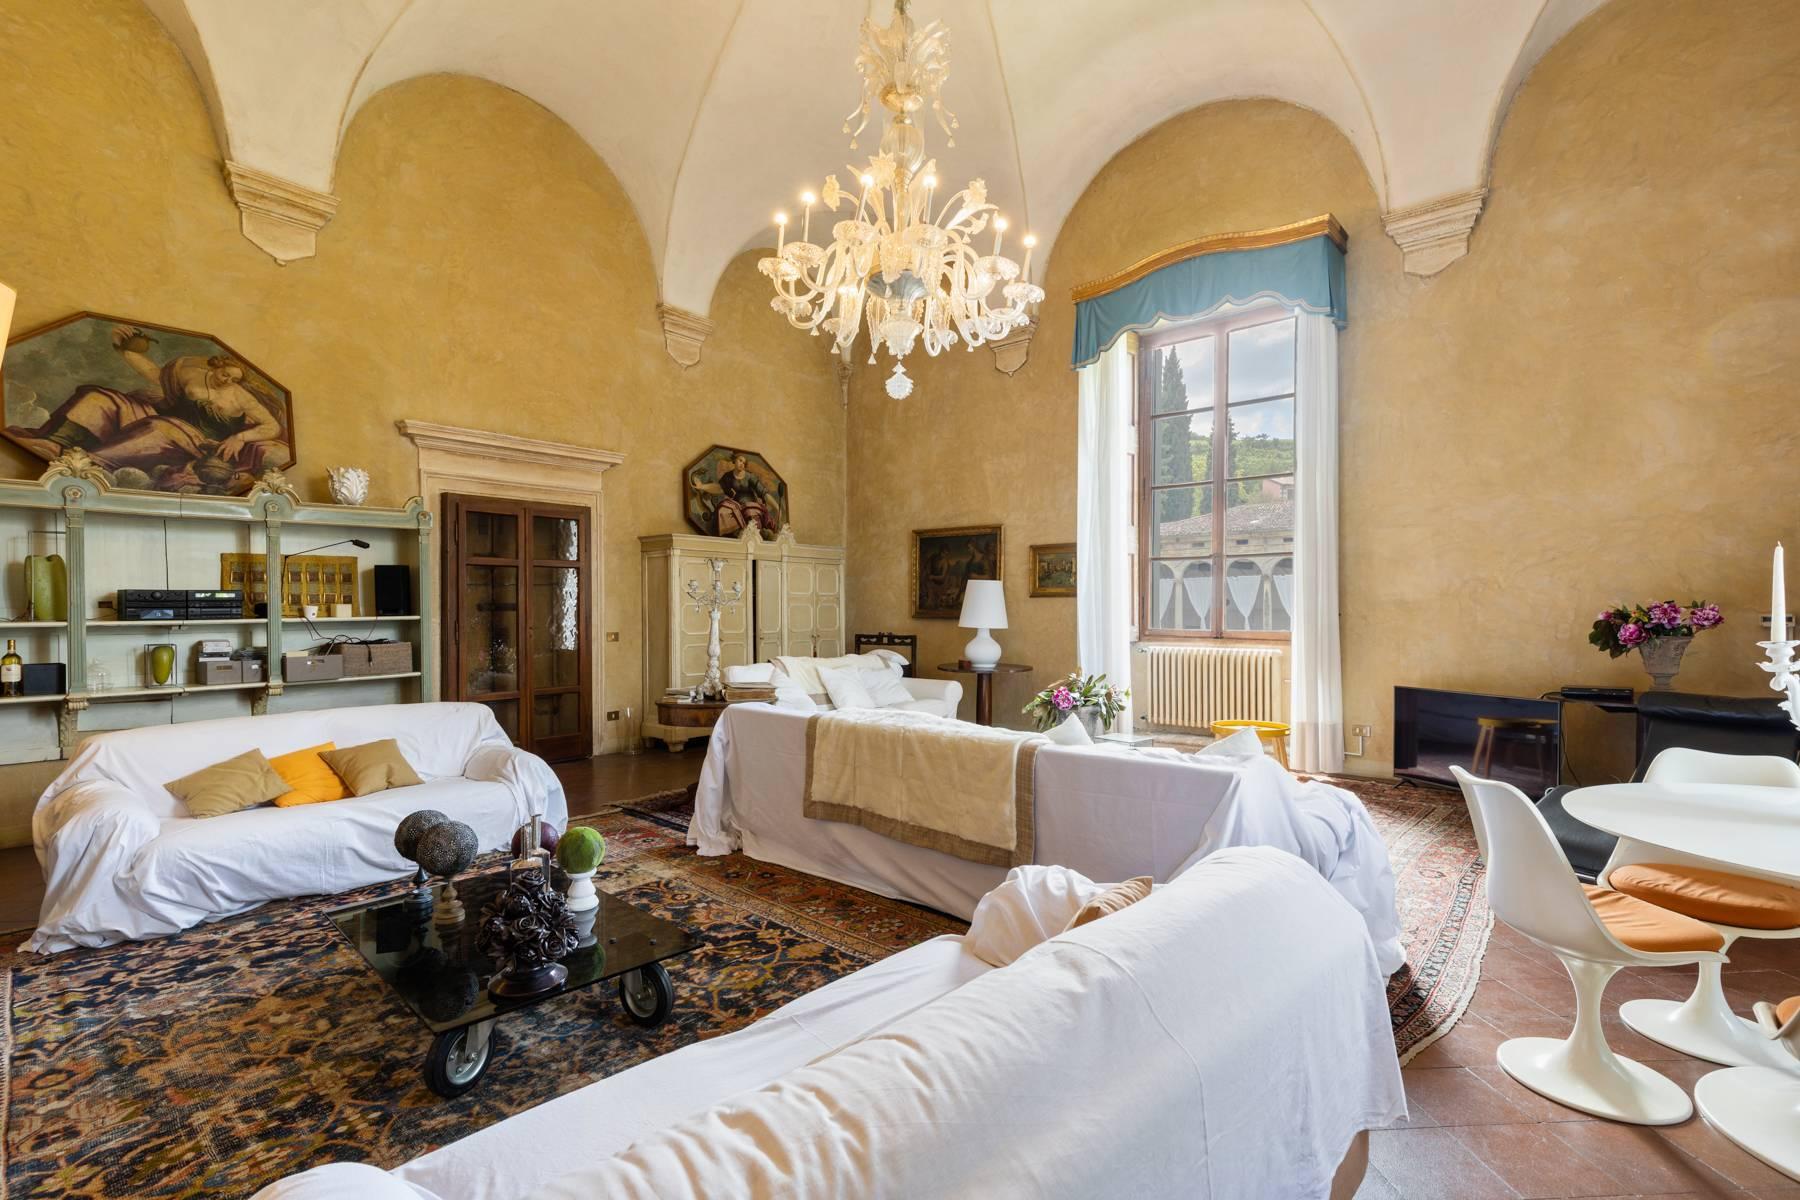 Affascinante villa Veneta a pochi minuti da Verona - 21